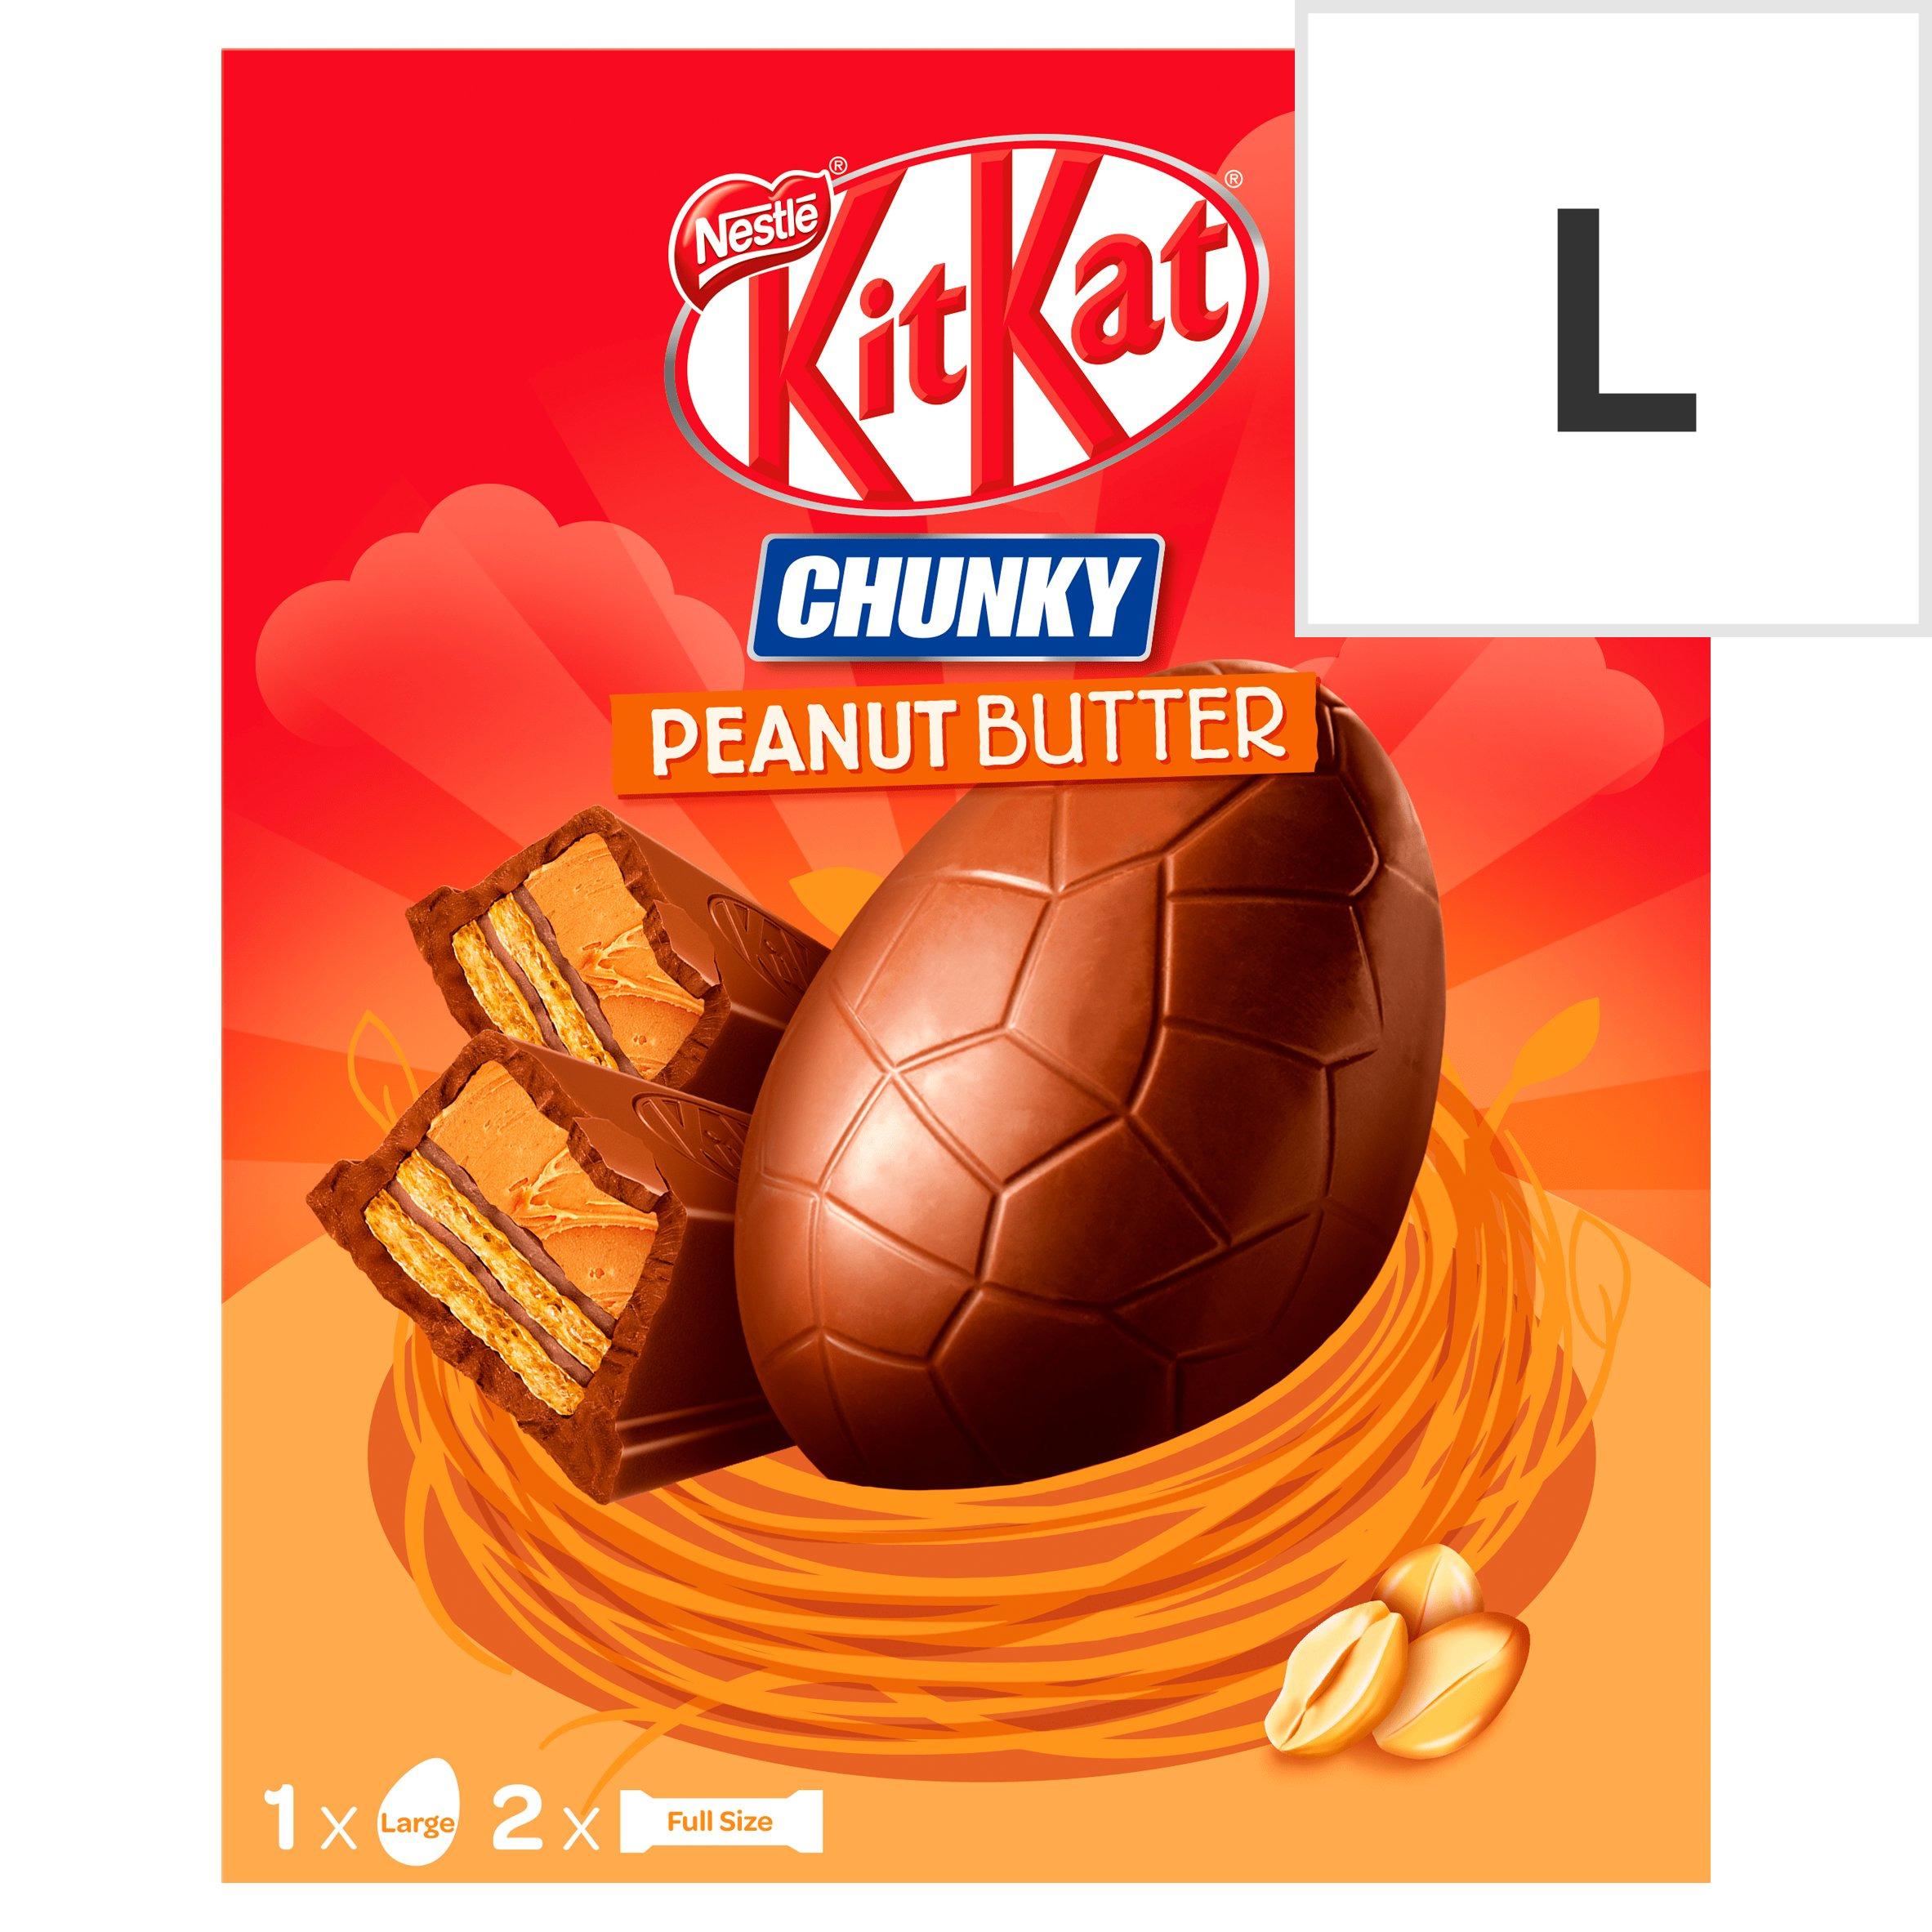 image 1 of Nestle Kit Kat Chunky Peanut Butter Large Egg 264G